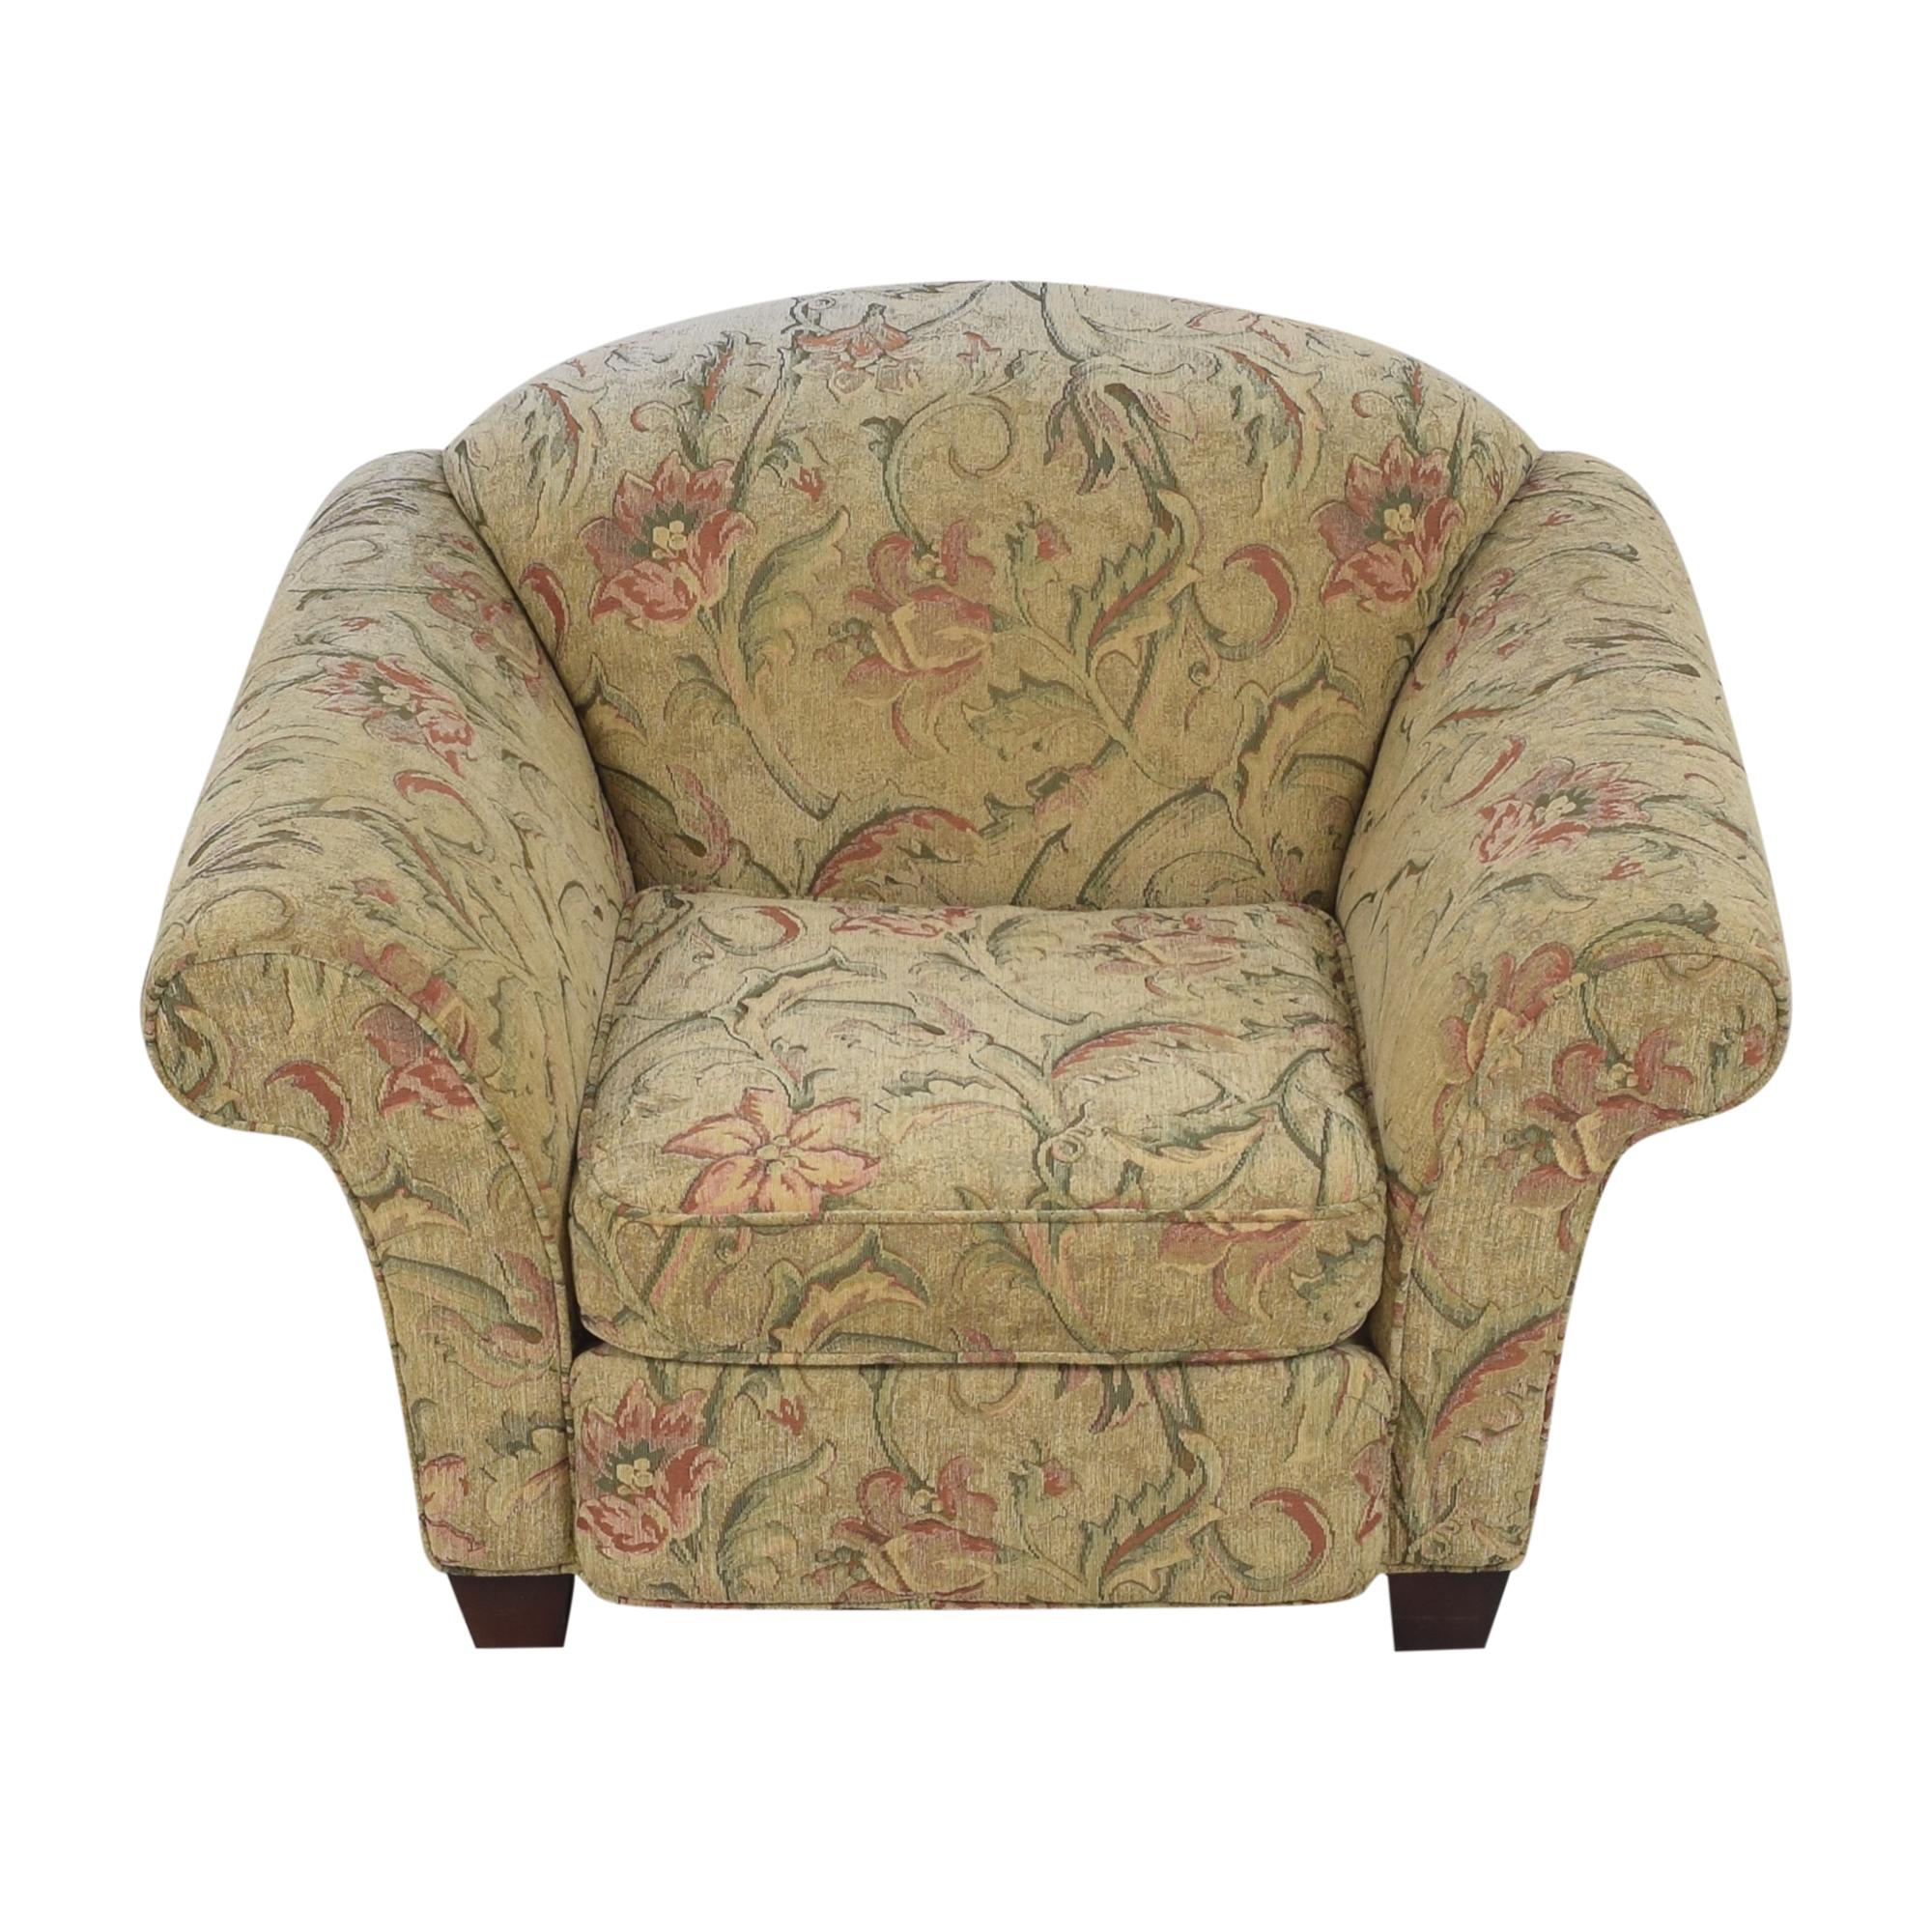 shop Braxton Culler Braxton Culler Floral Roll Arm Chair online